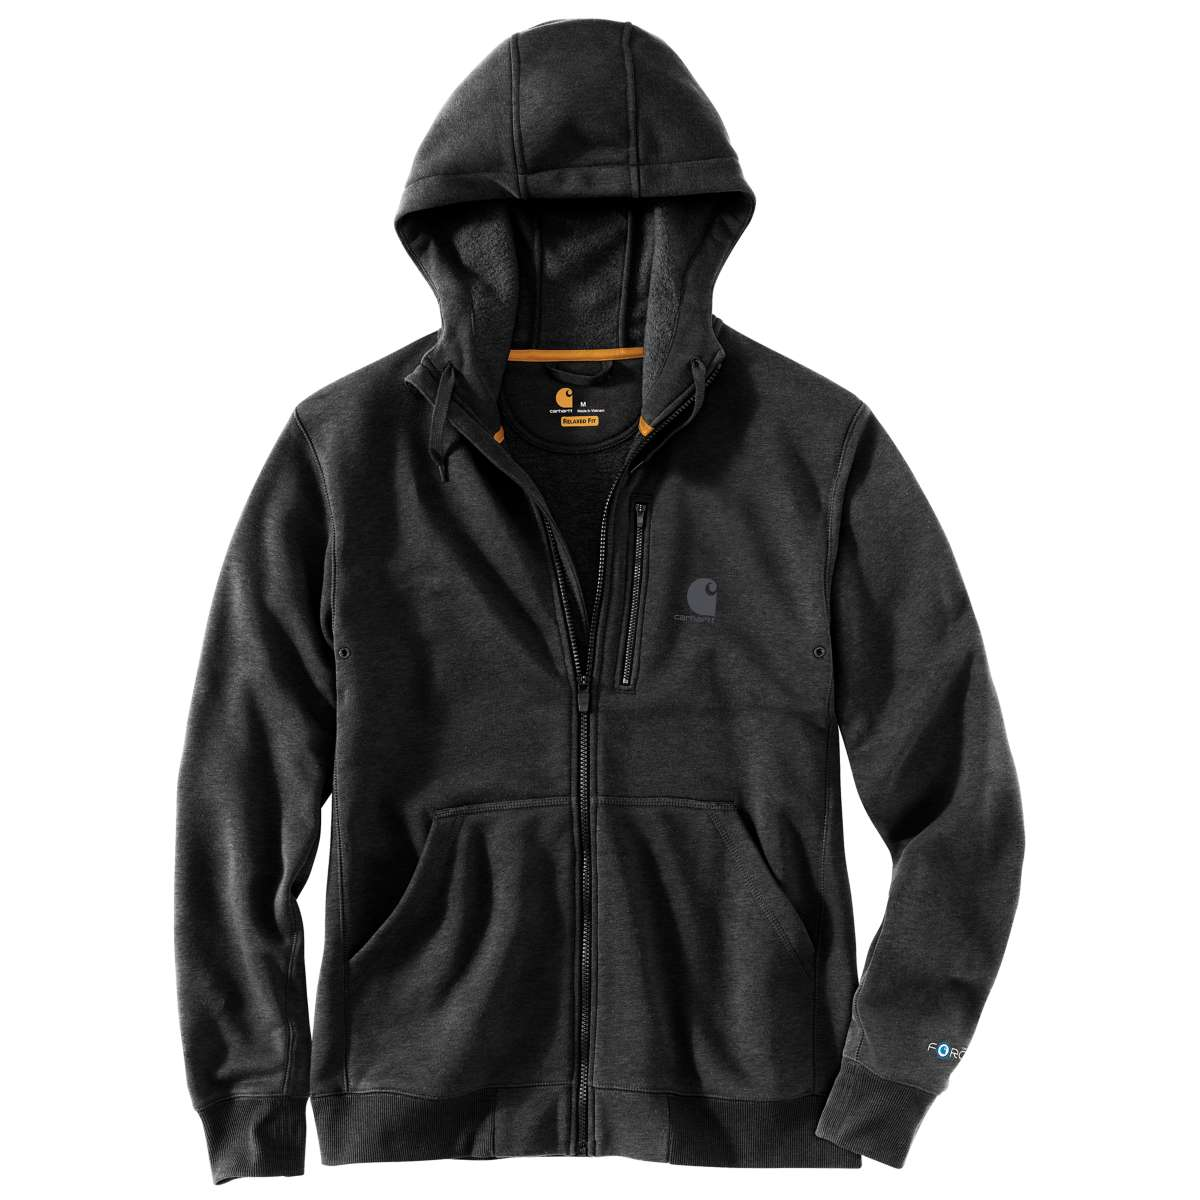 Carhartt Men's Force Delmont Graphic Full-Zip Hooded Sweatshirt, Extended Sizes - Black, 4XL